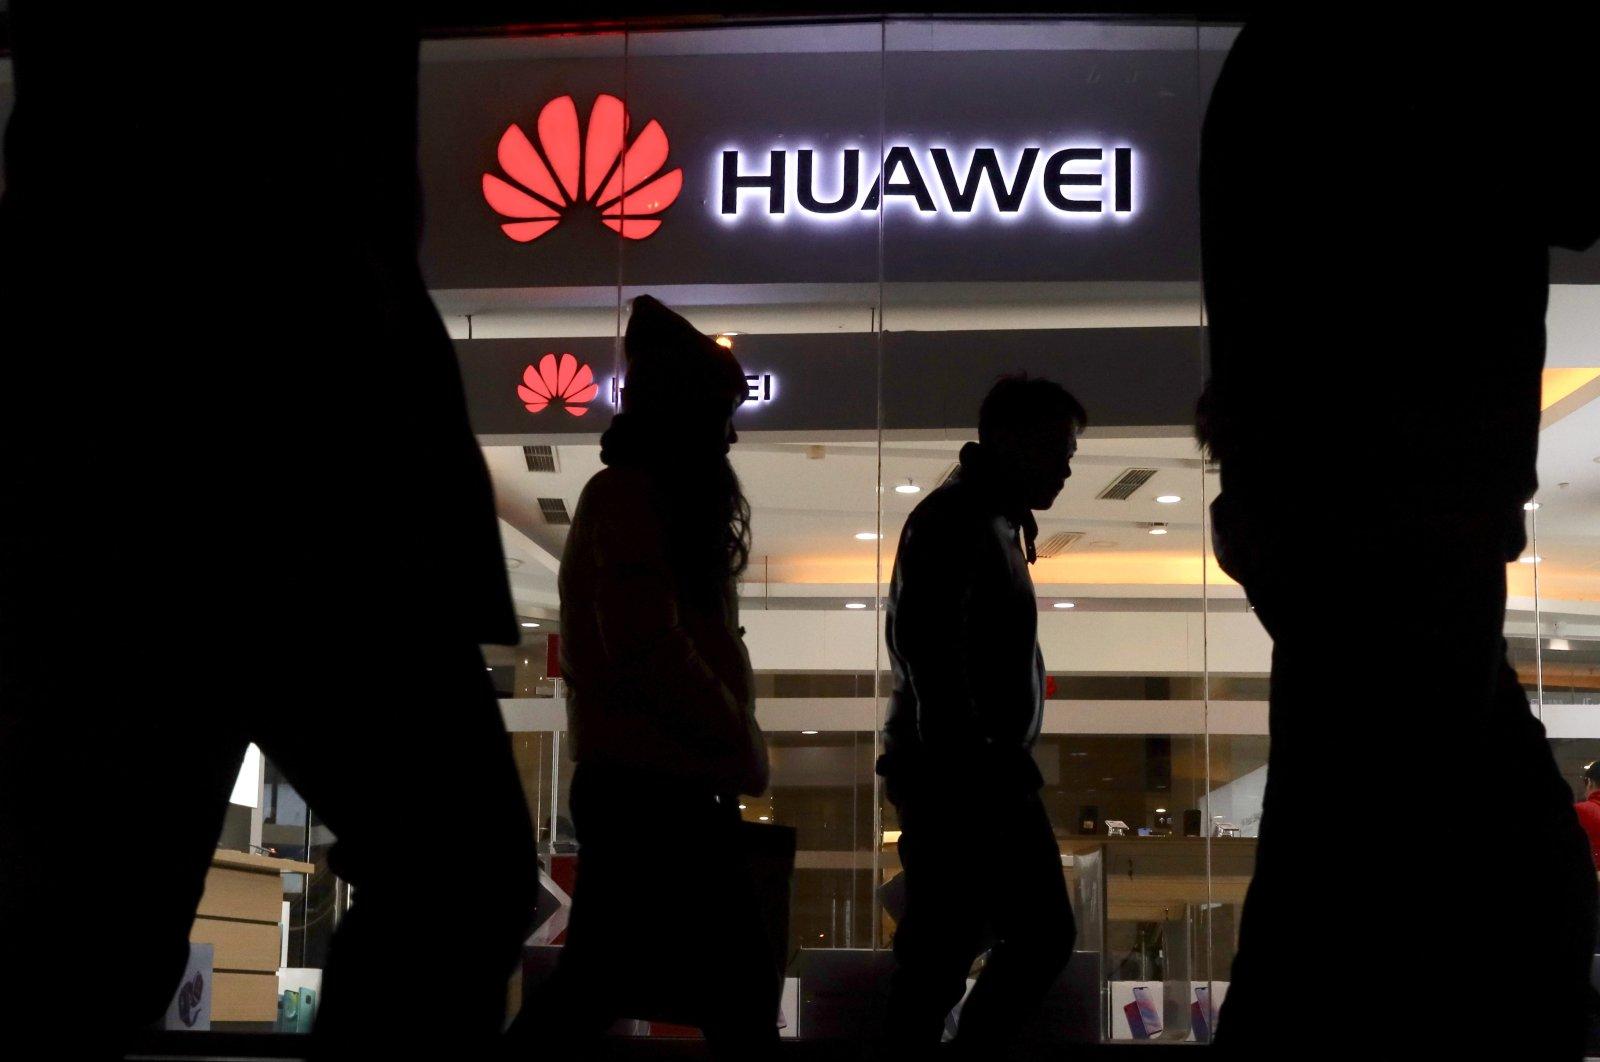 Pedestrians walk past a Huawei retail shop in Beijing, Dec. 6, 2018. (AP Photo)